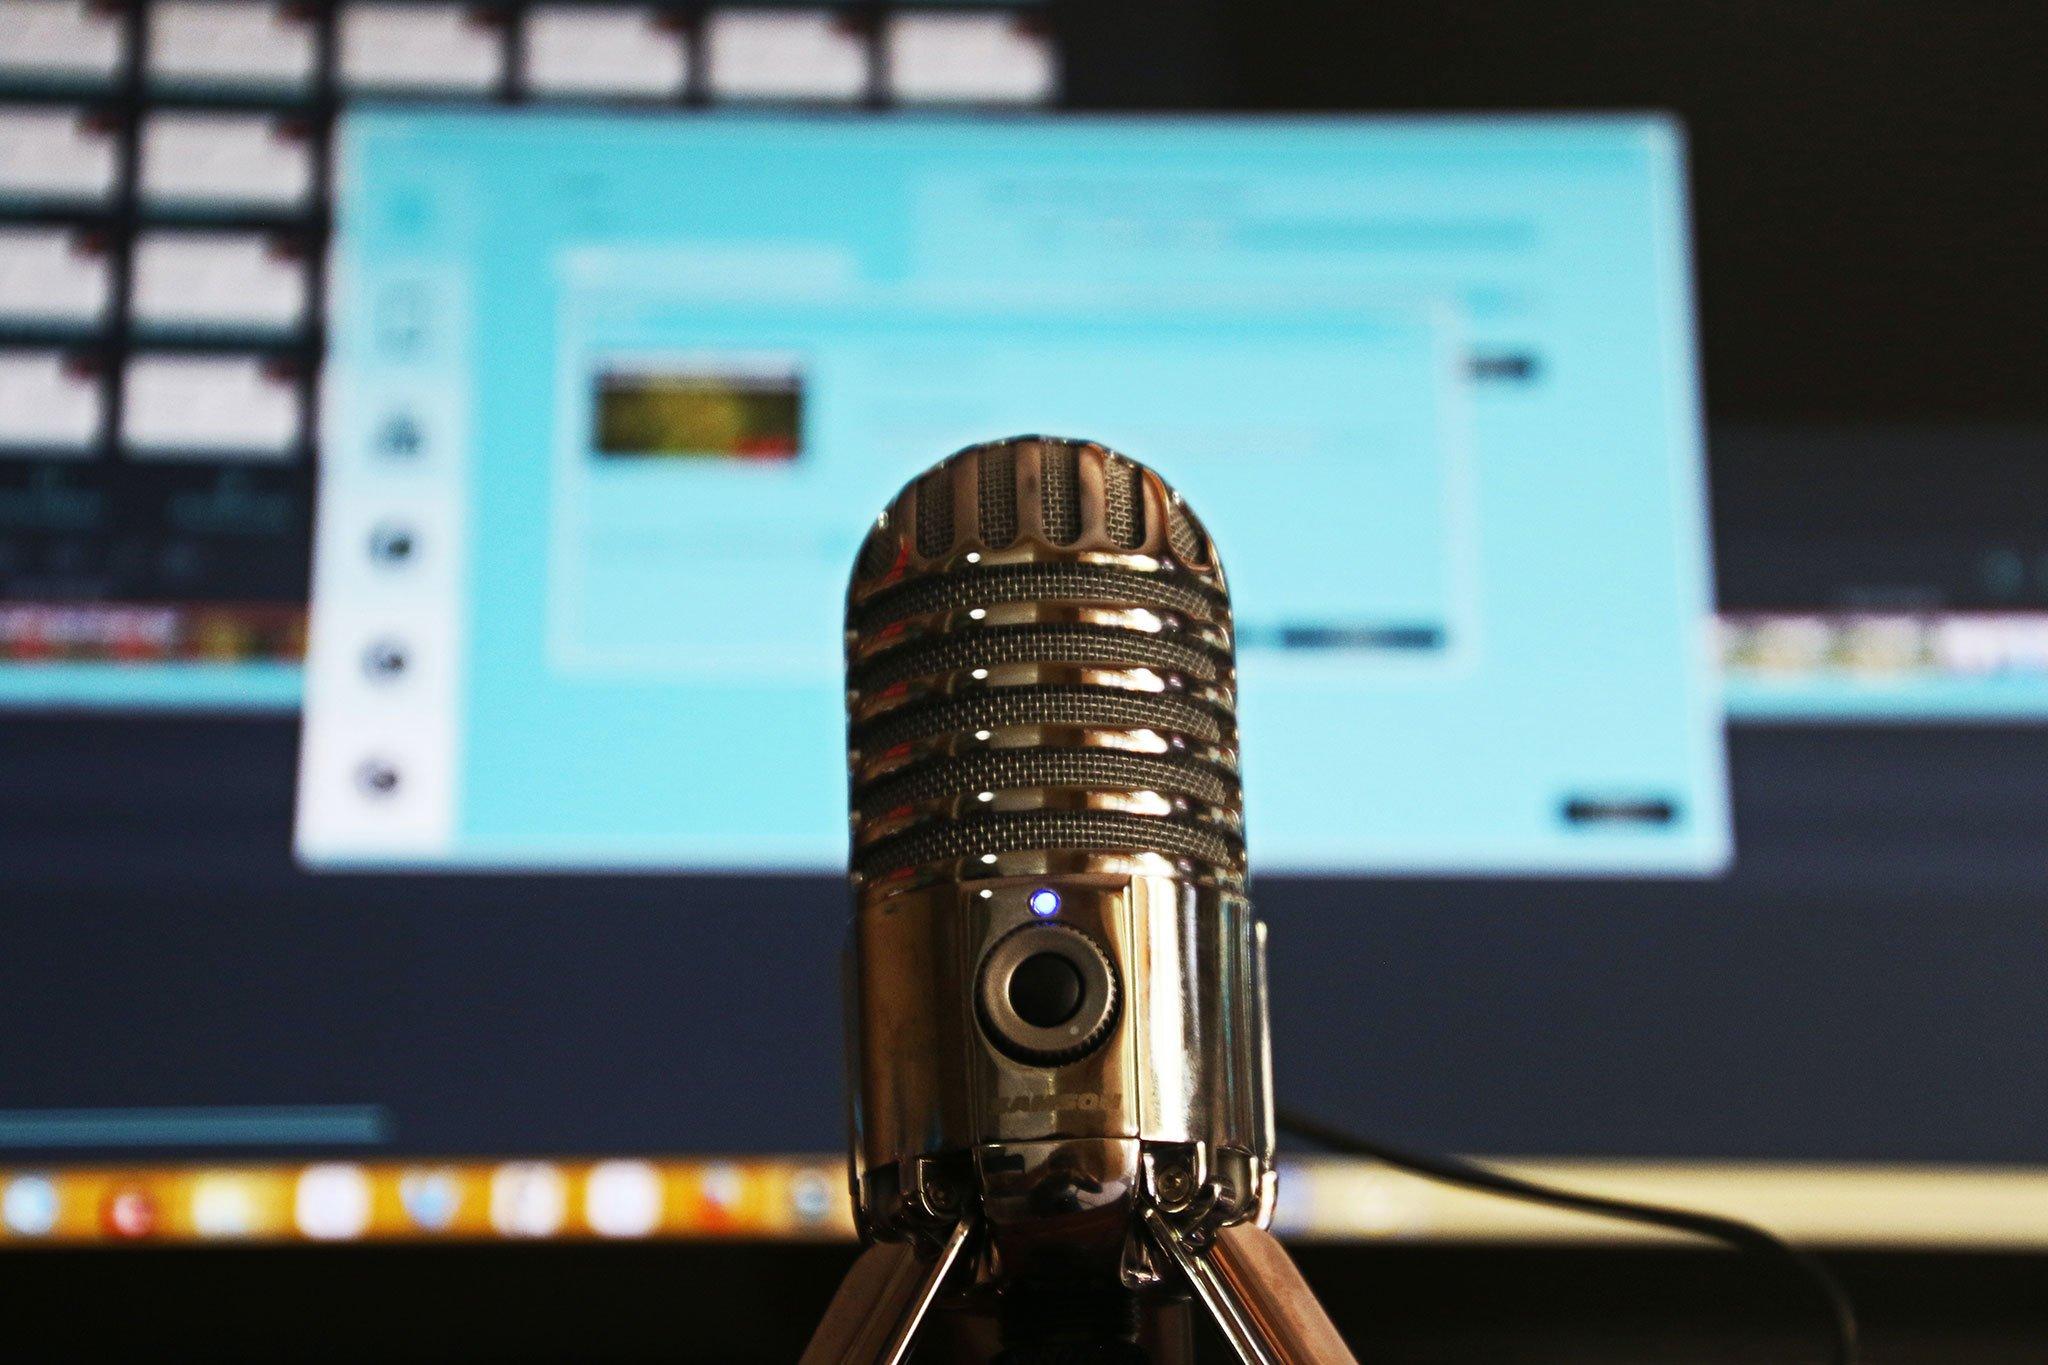 Image of podcast microphone uploaded to kalika.com